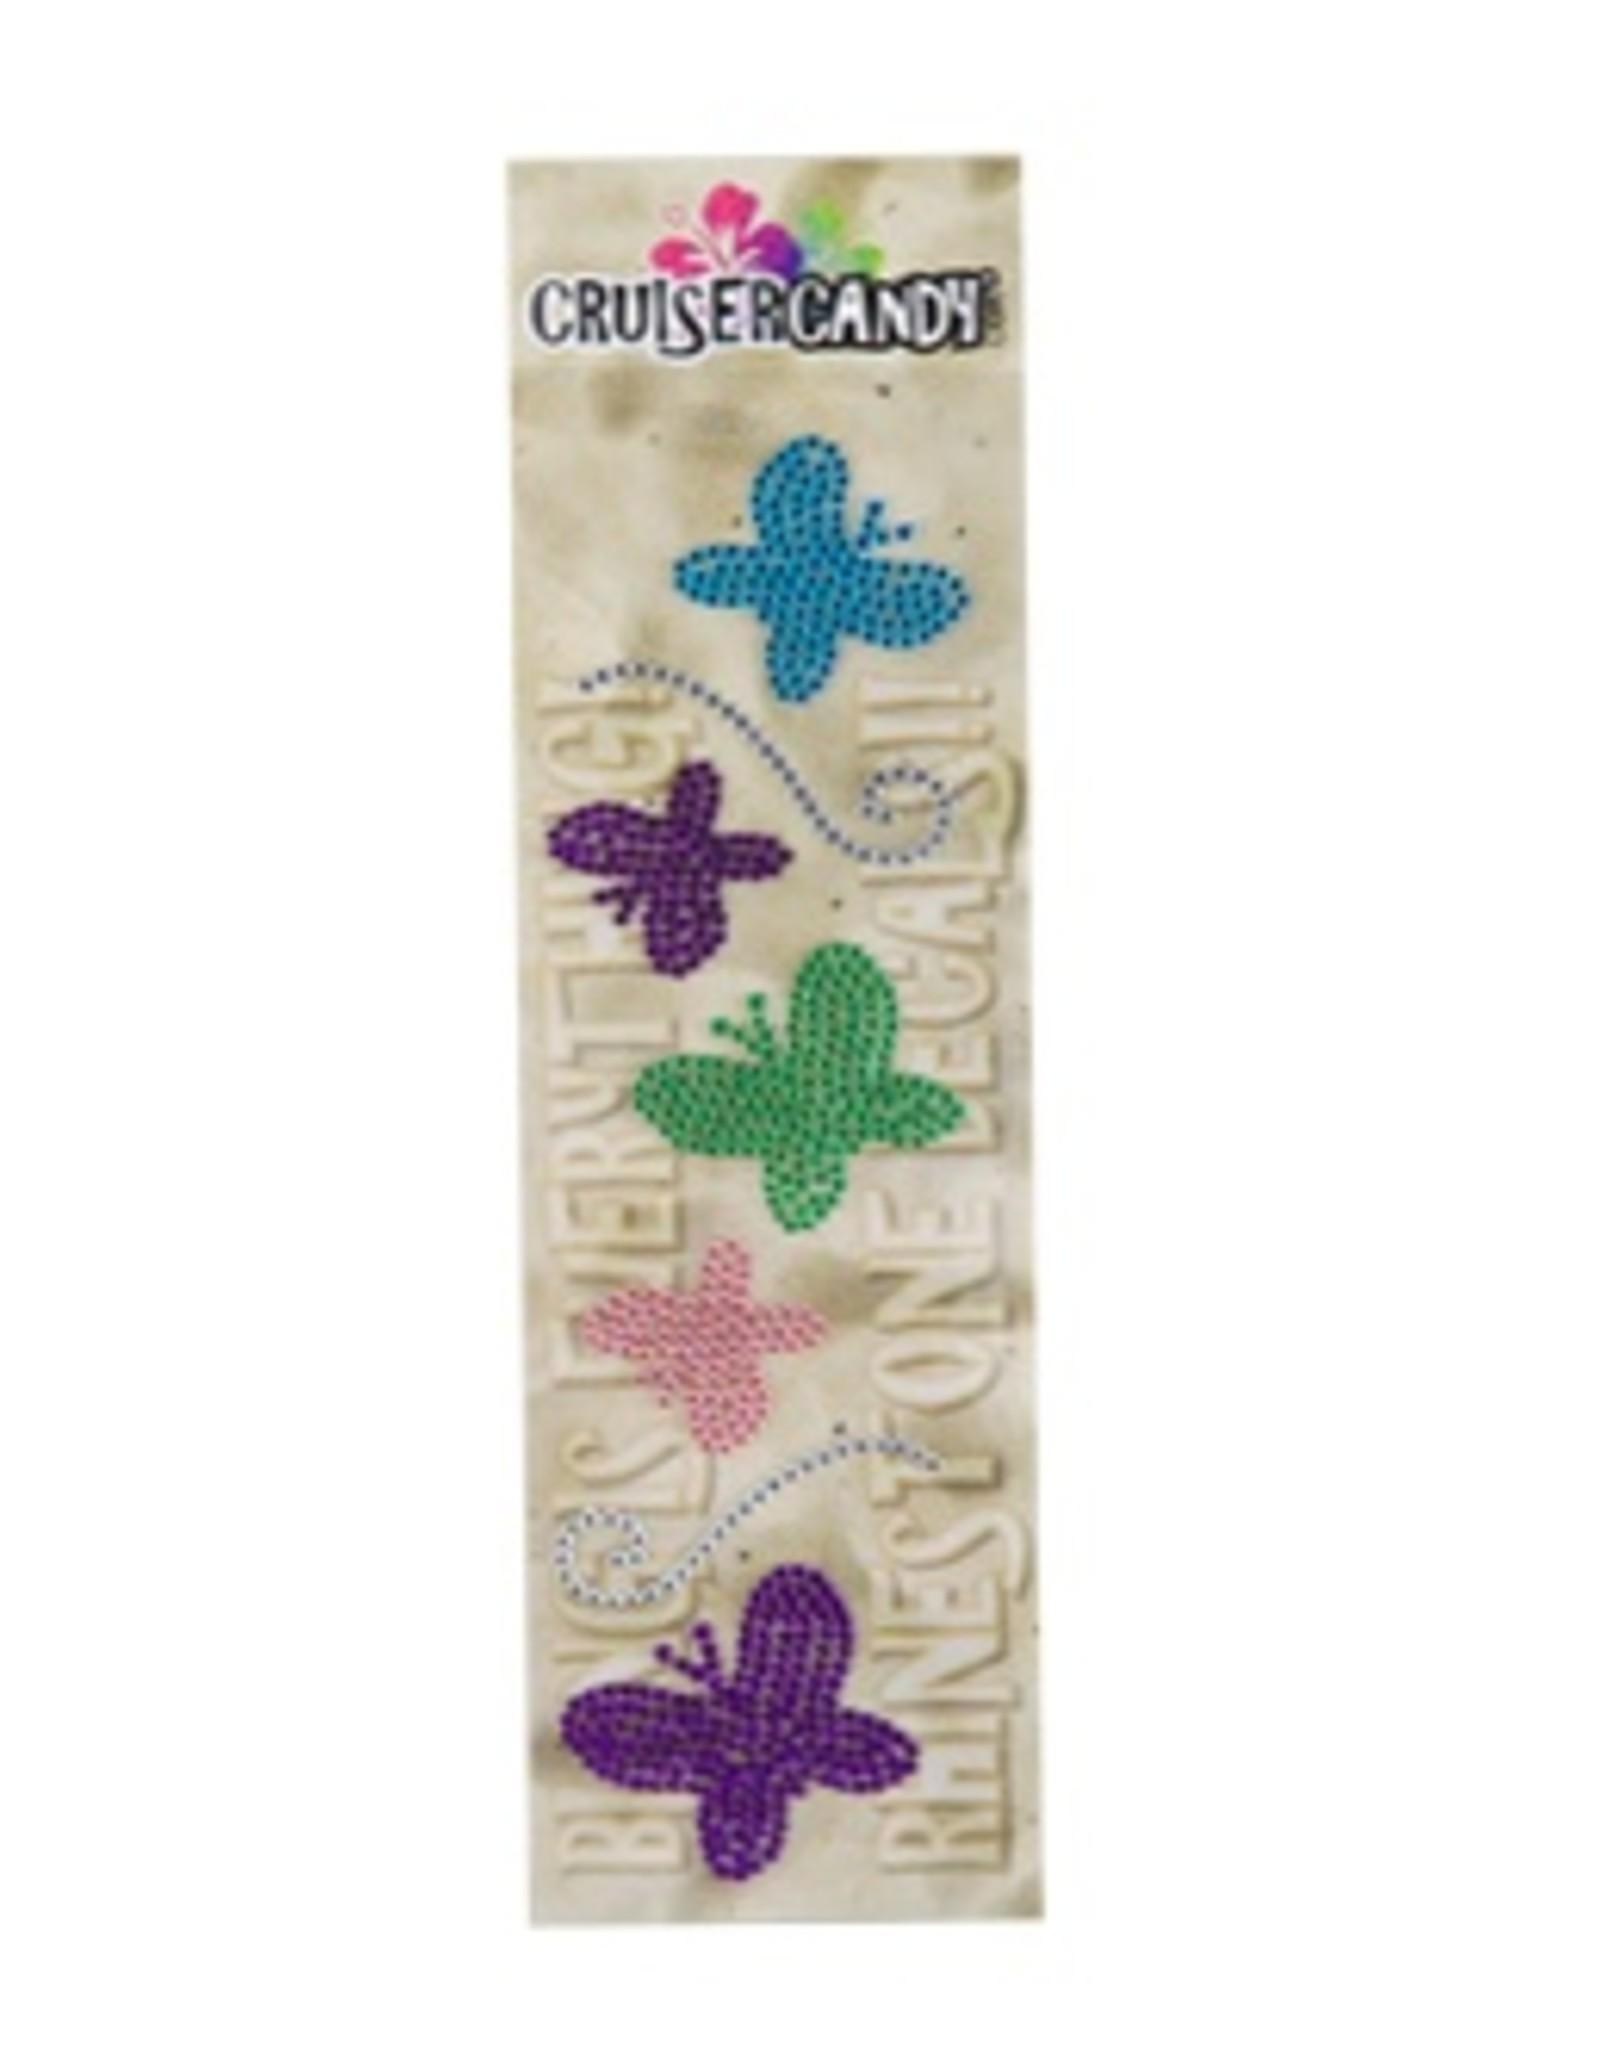 Cruiser Candy Butterfly Rhinestone Decals